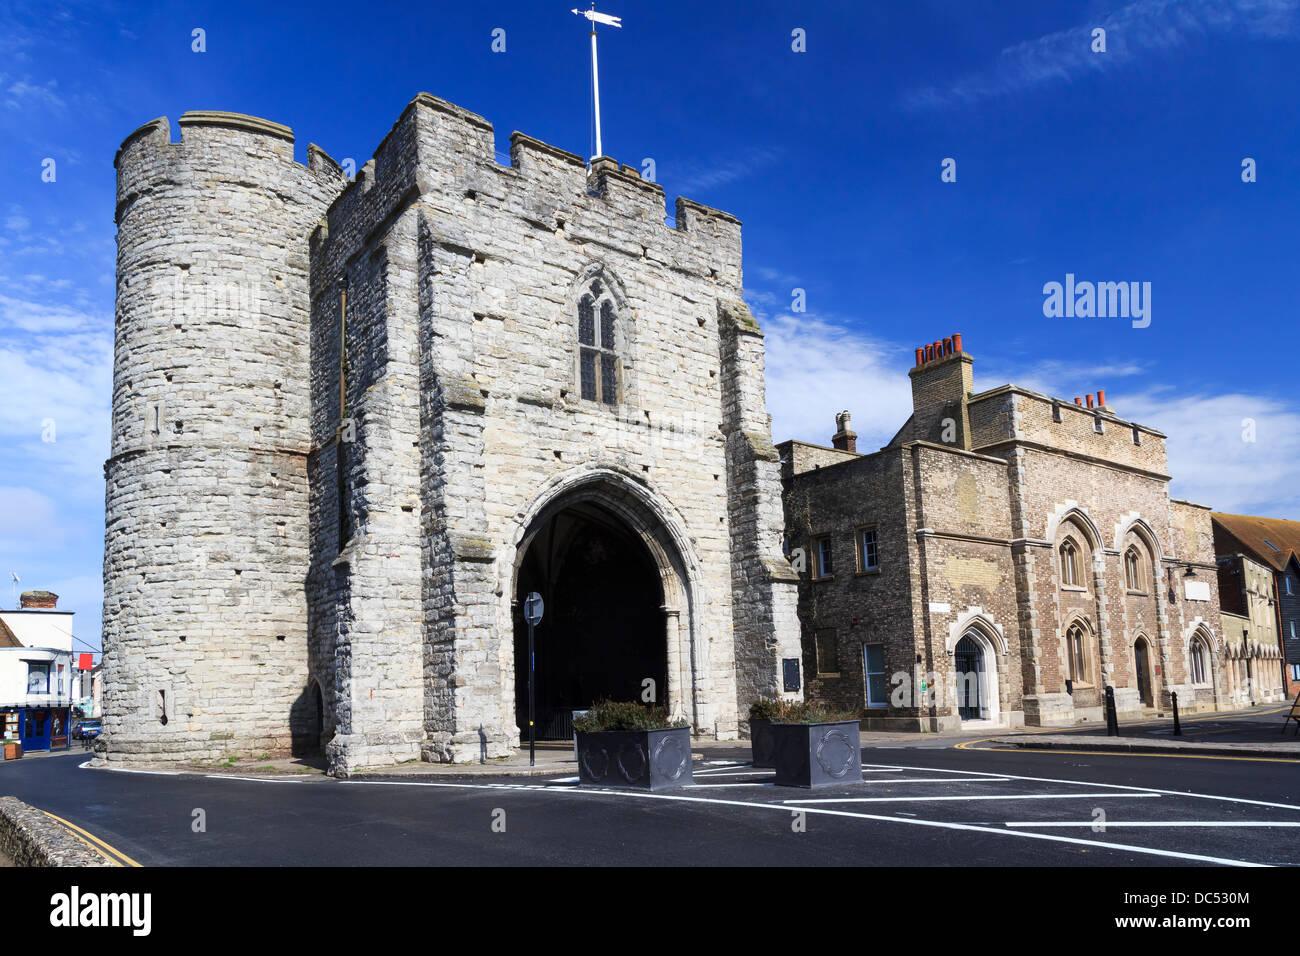 The 14th century Westgate Medieval Gatehouse at Canterbury Kent England UK - Stock Image